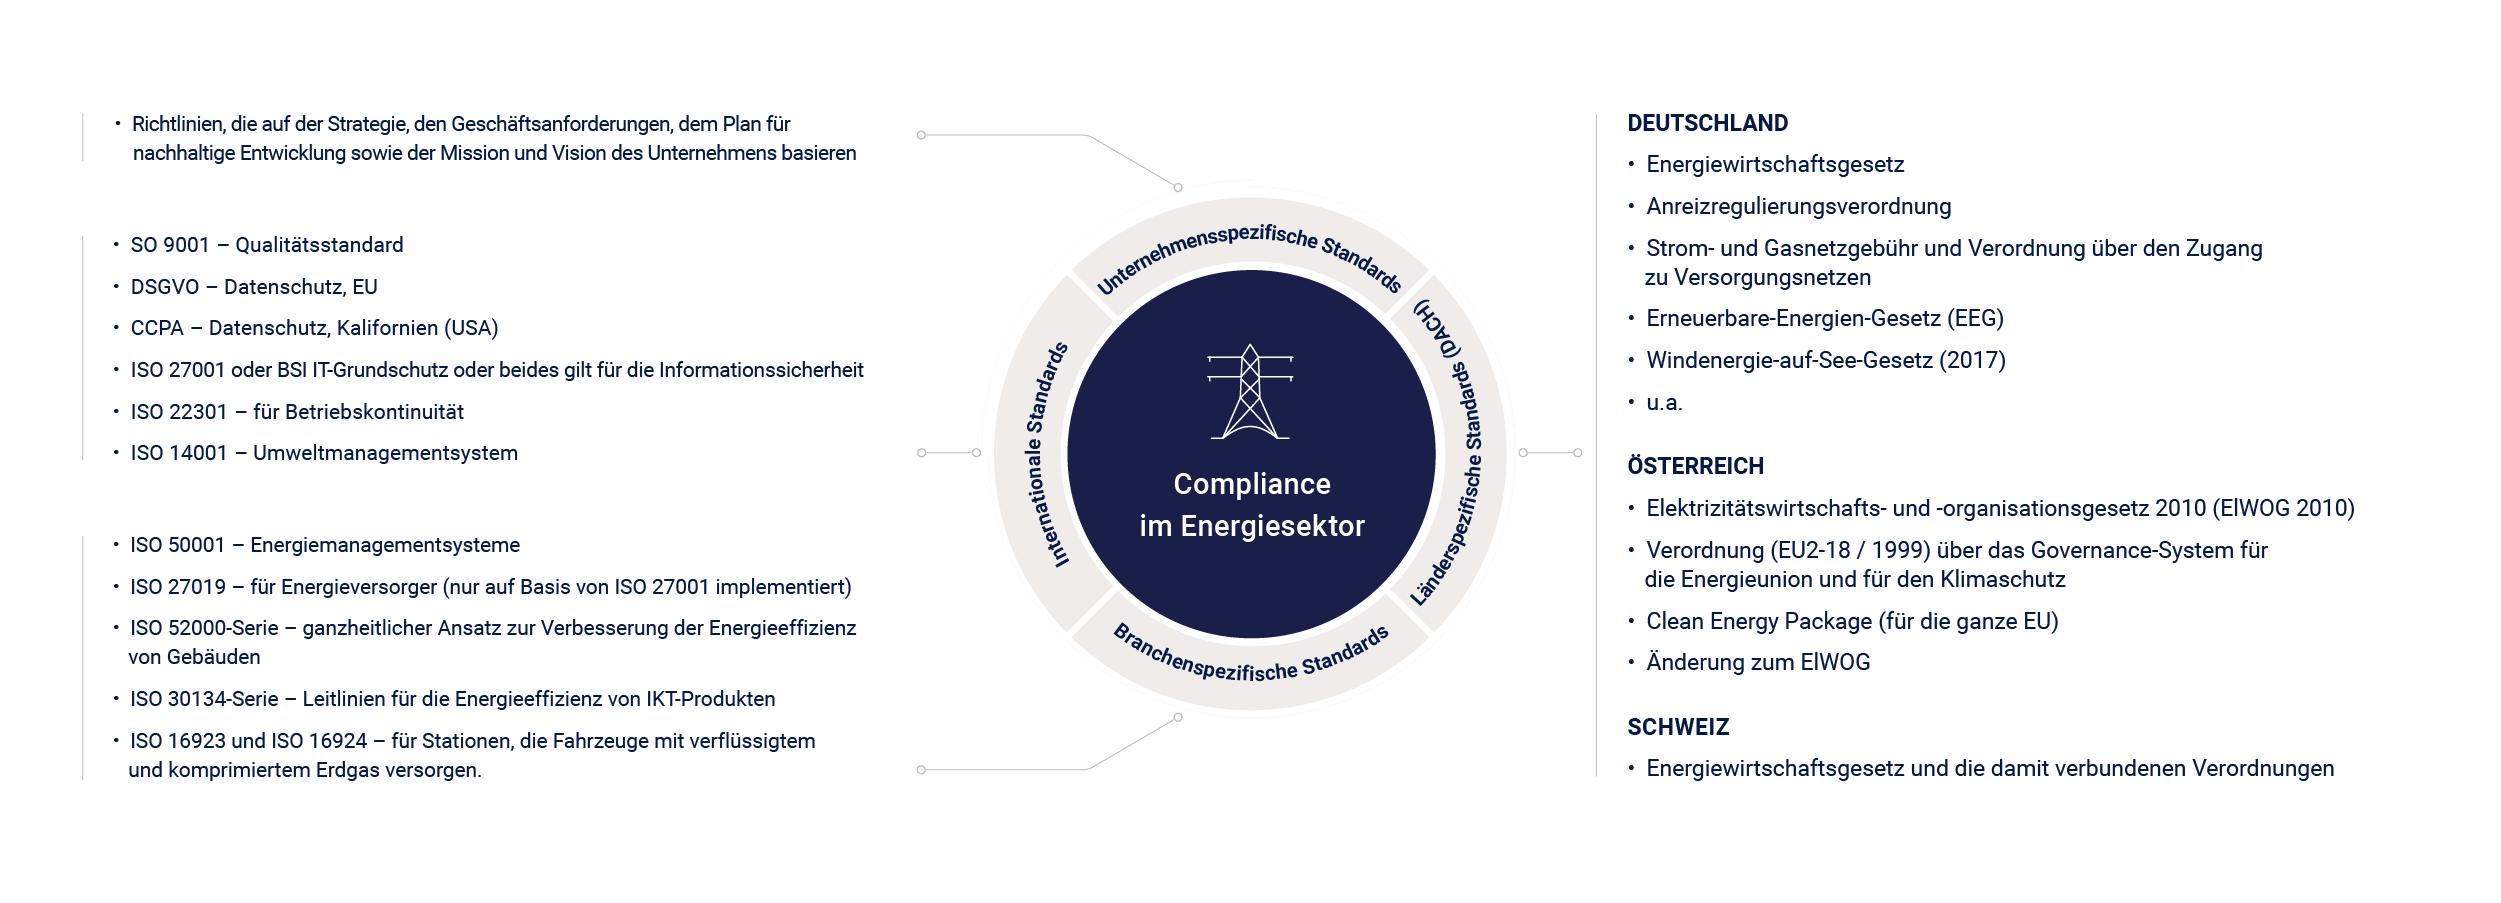 Compliance Energiesektor